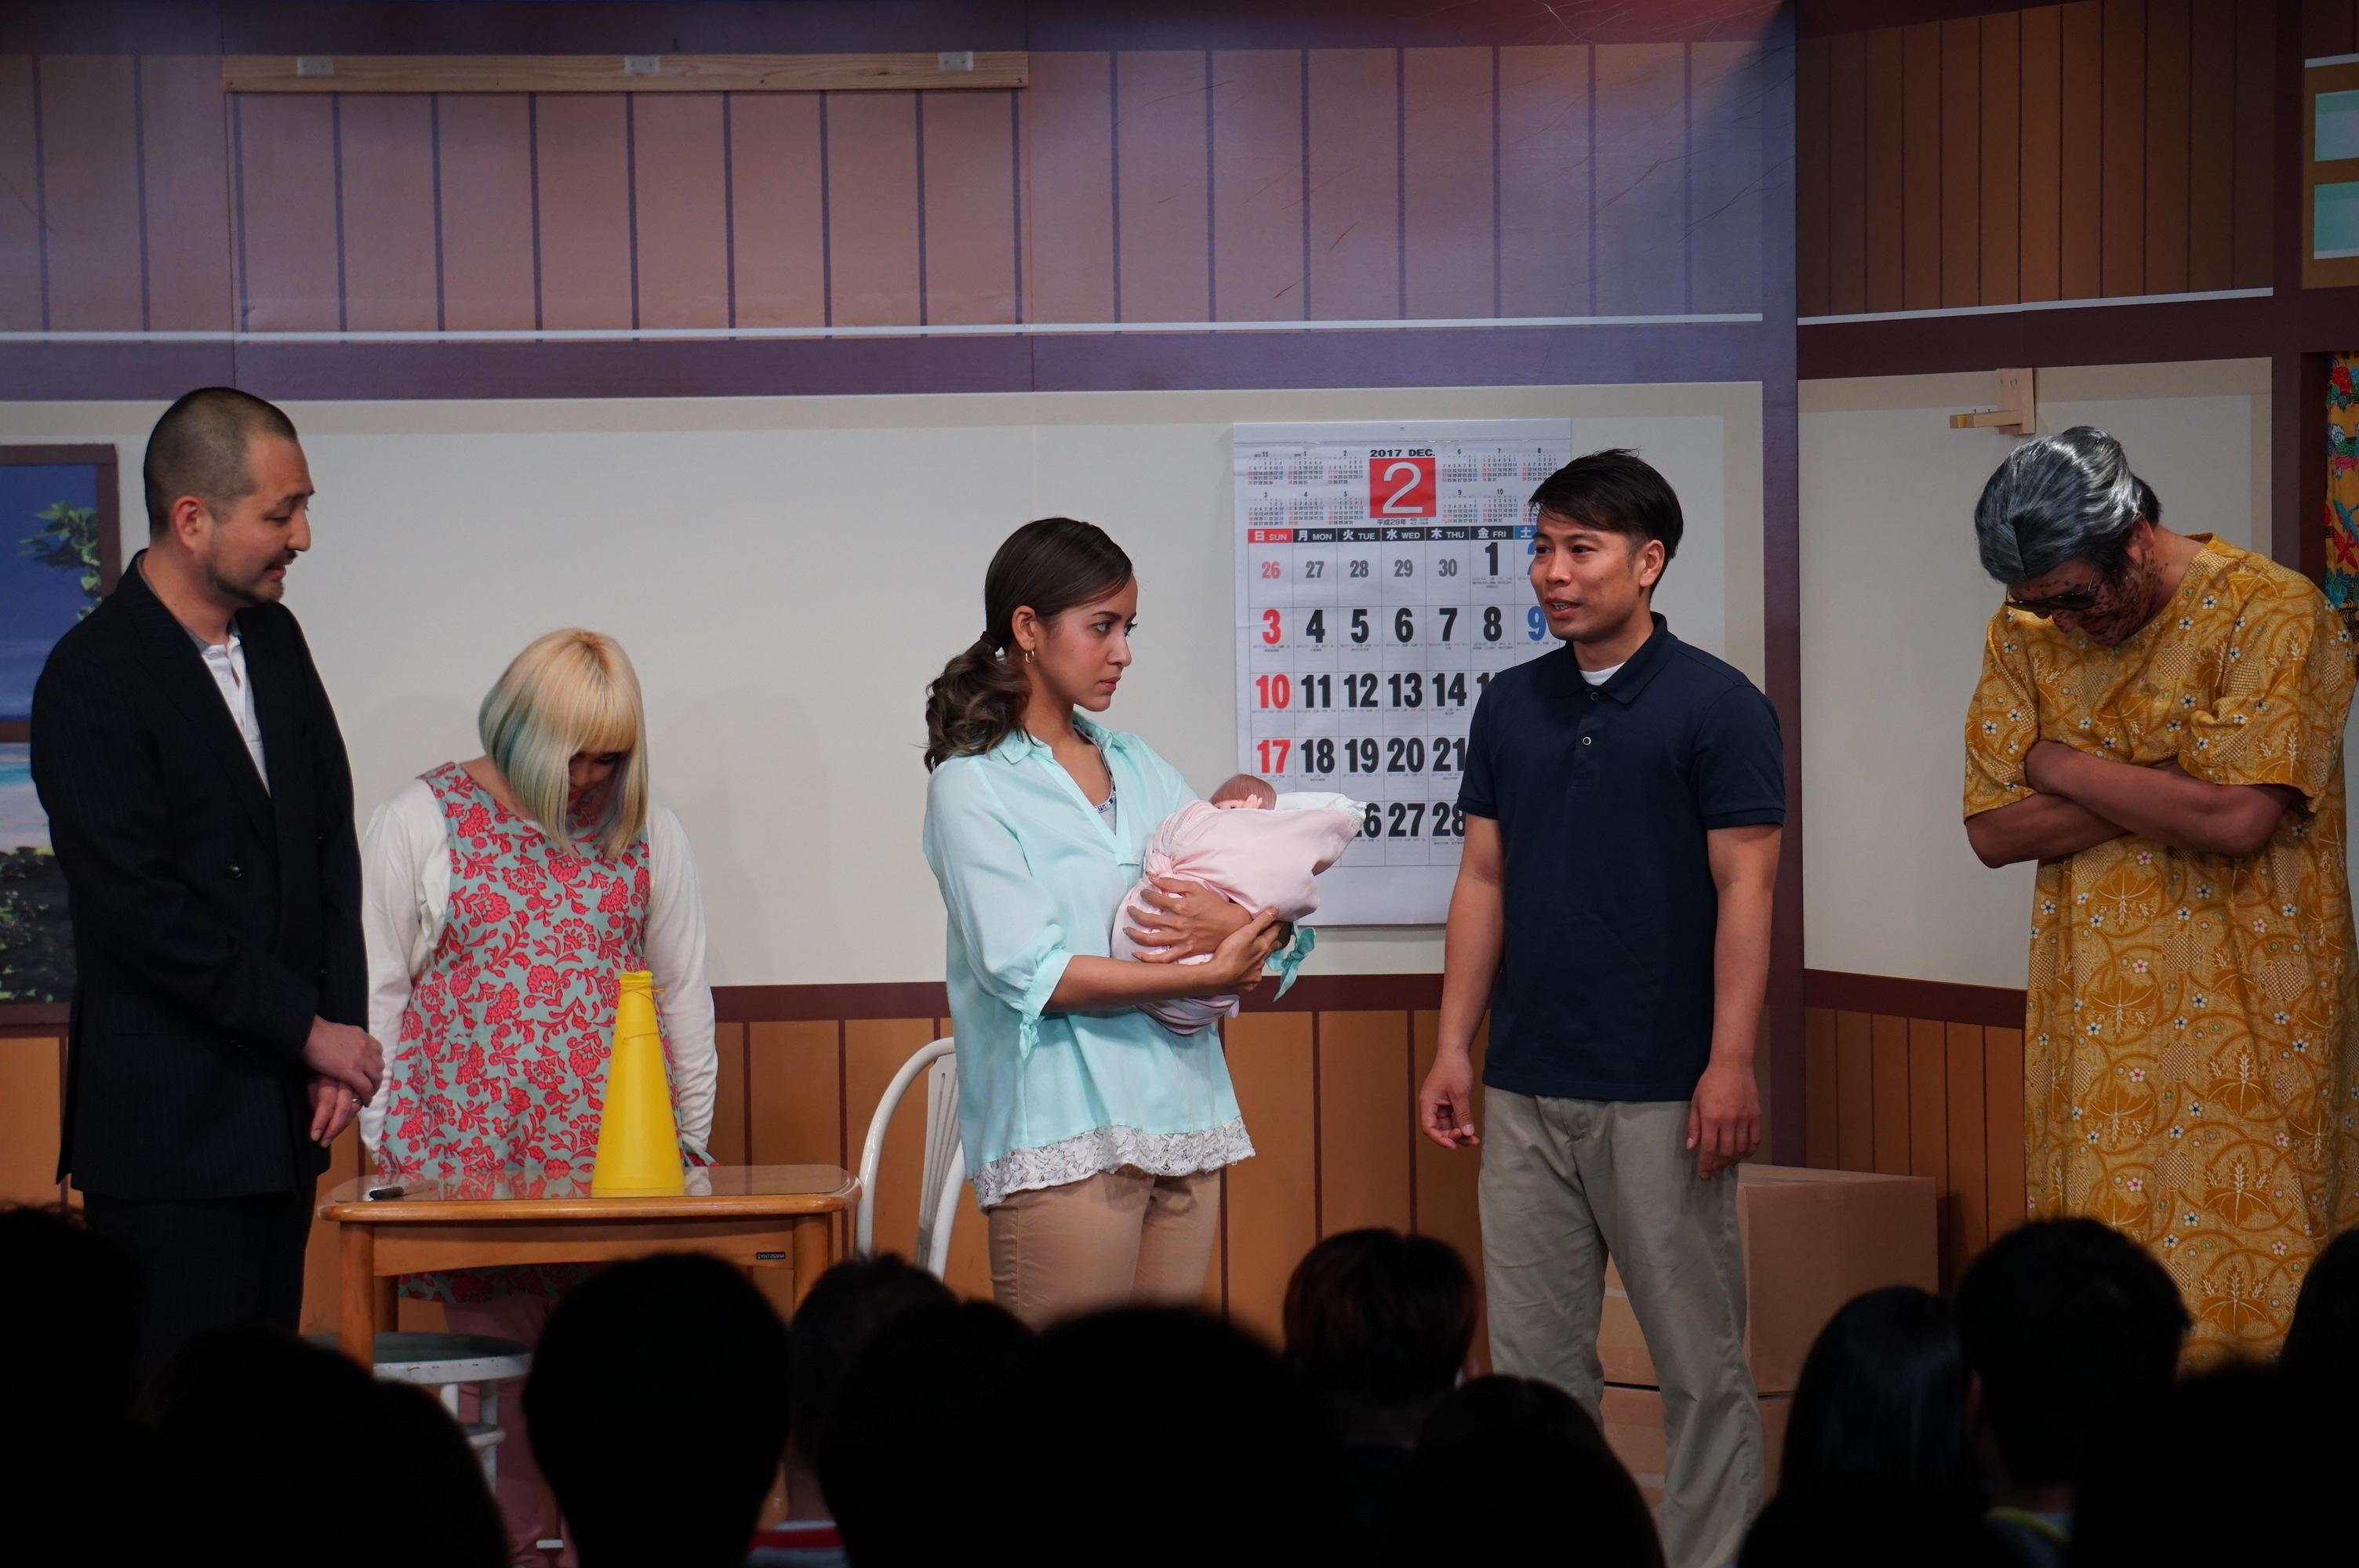 http://news.yoshimoto.co.jp/20170314202116-38fa3f06d43033de4fbd2e8b5cb5dc67fec408b5.jpg